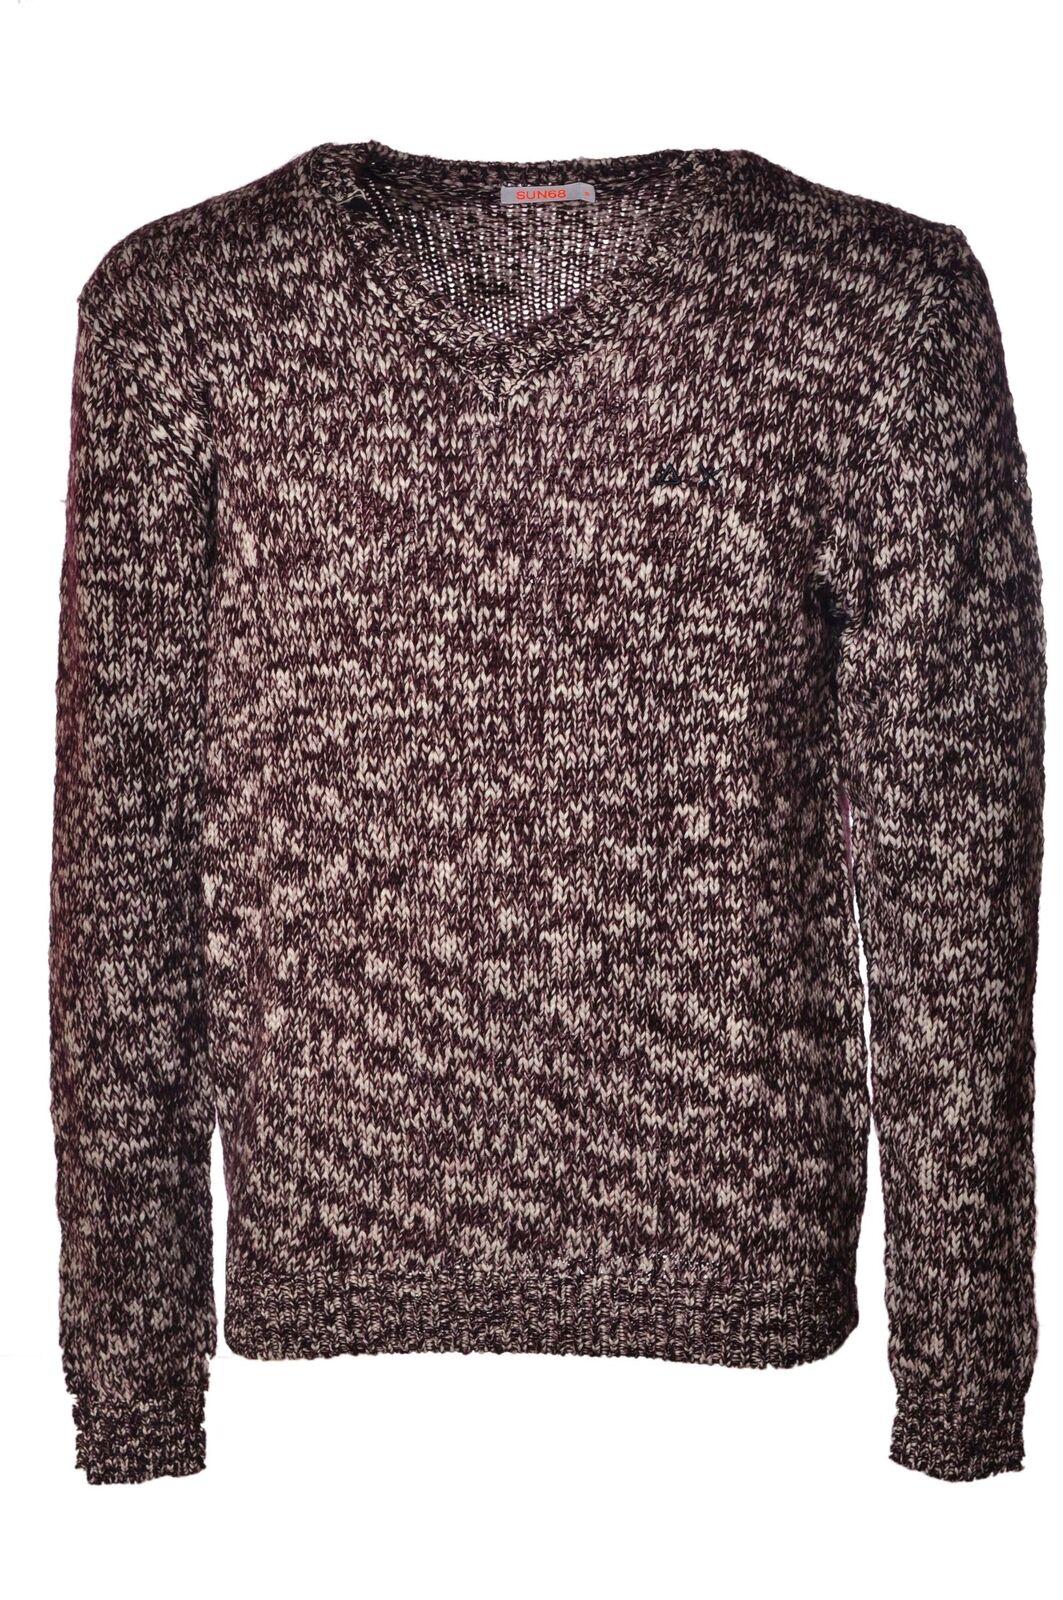 Sun 68 - Knitwear-Sweaters - Man - Braun - 4047018B183620